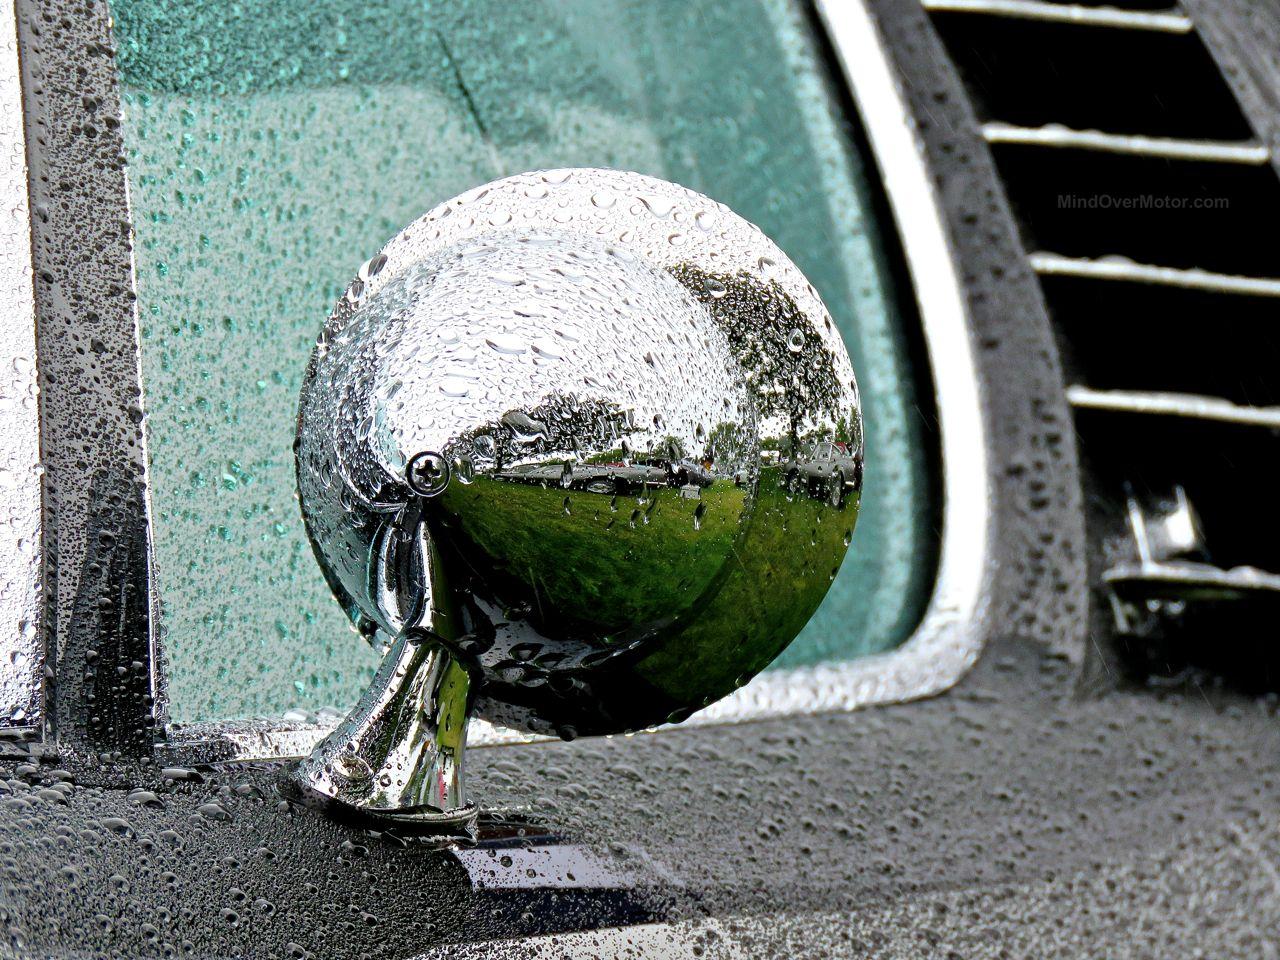 Wet Lamborghini Miura Greenwich 2